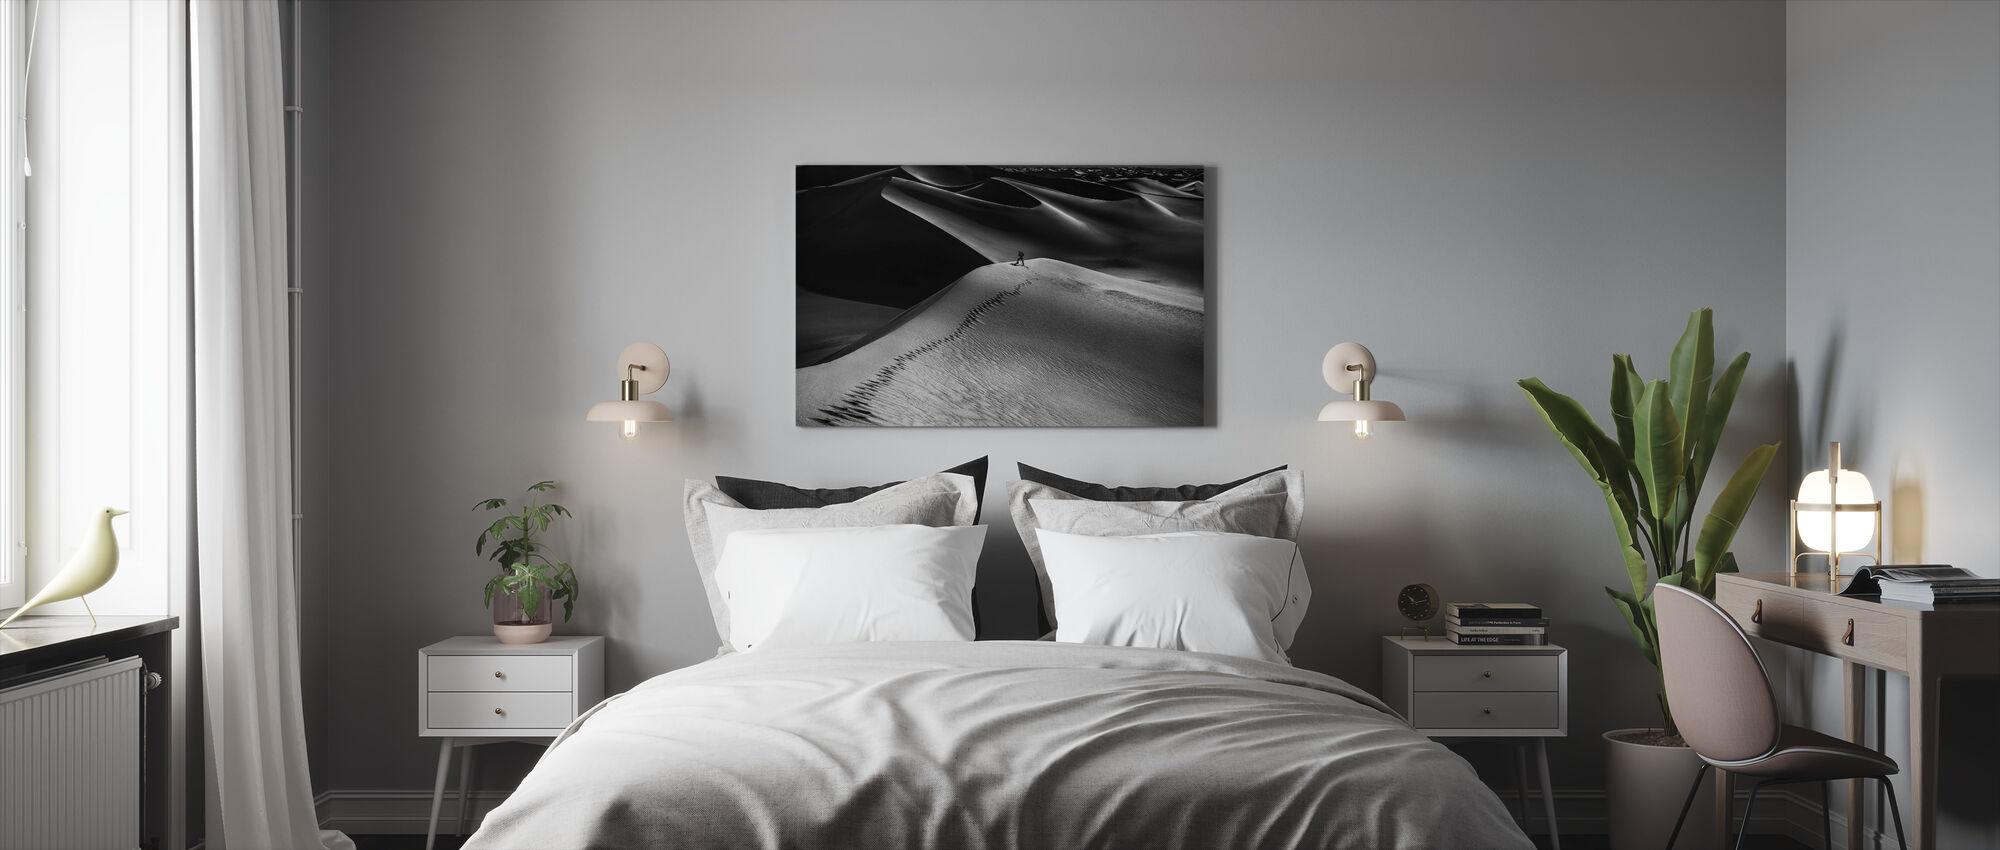 One Set of Footprints - Canvas print - Bedroom